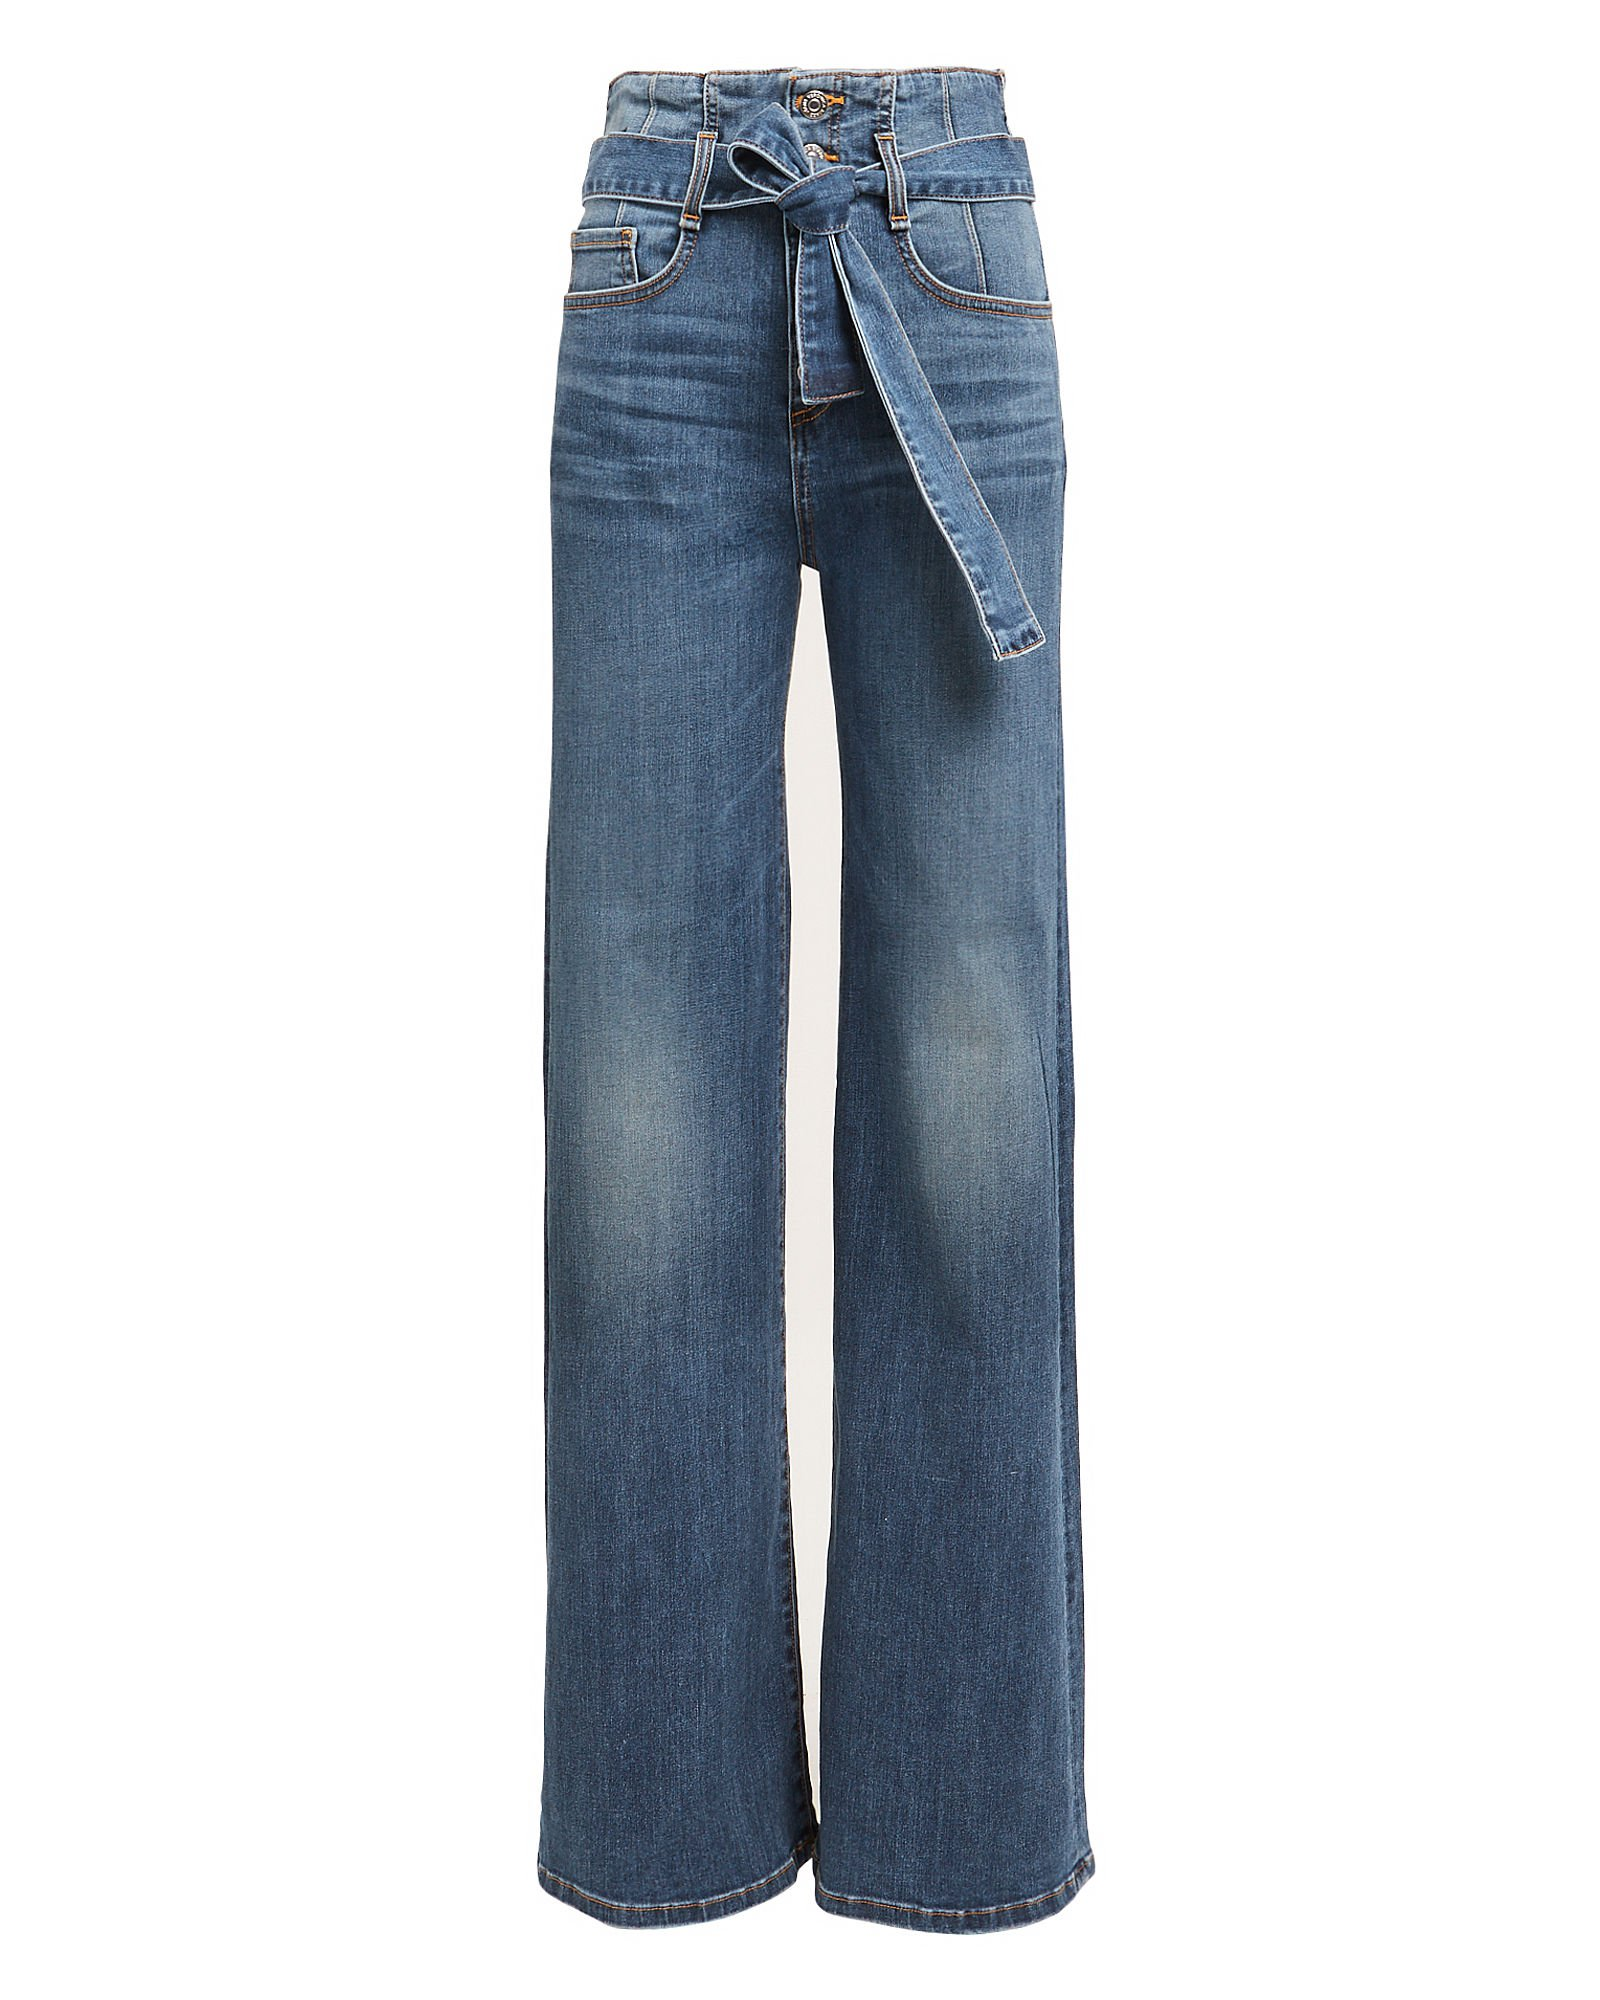 Rosanna Wide Leg Jeans